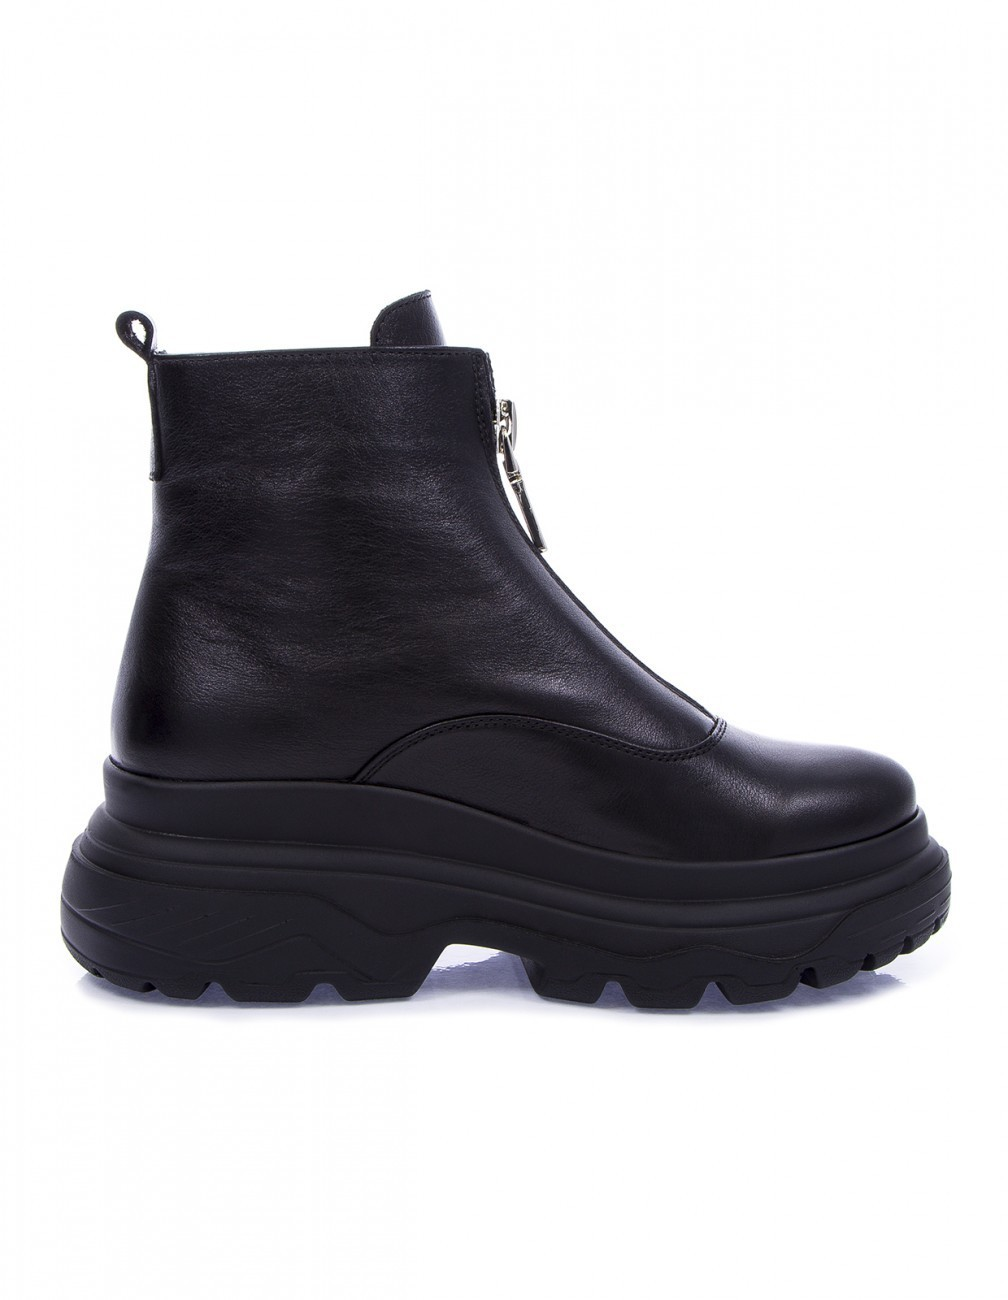 15 пар обуви на осень-Фото 5